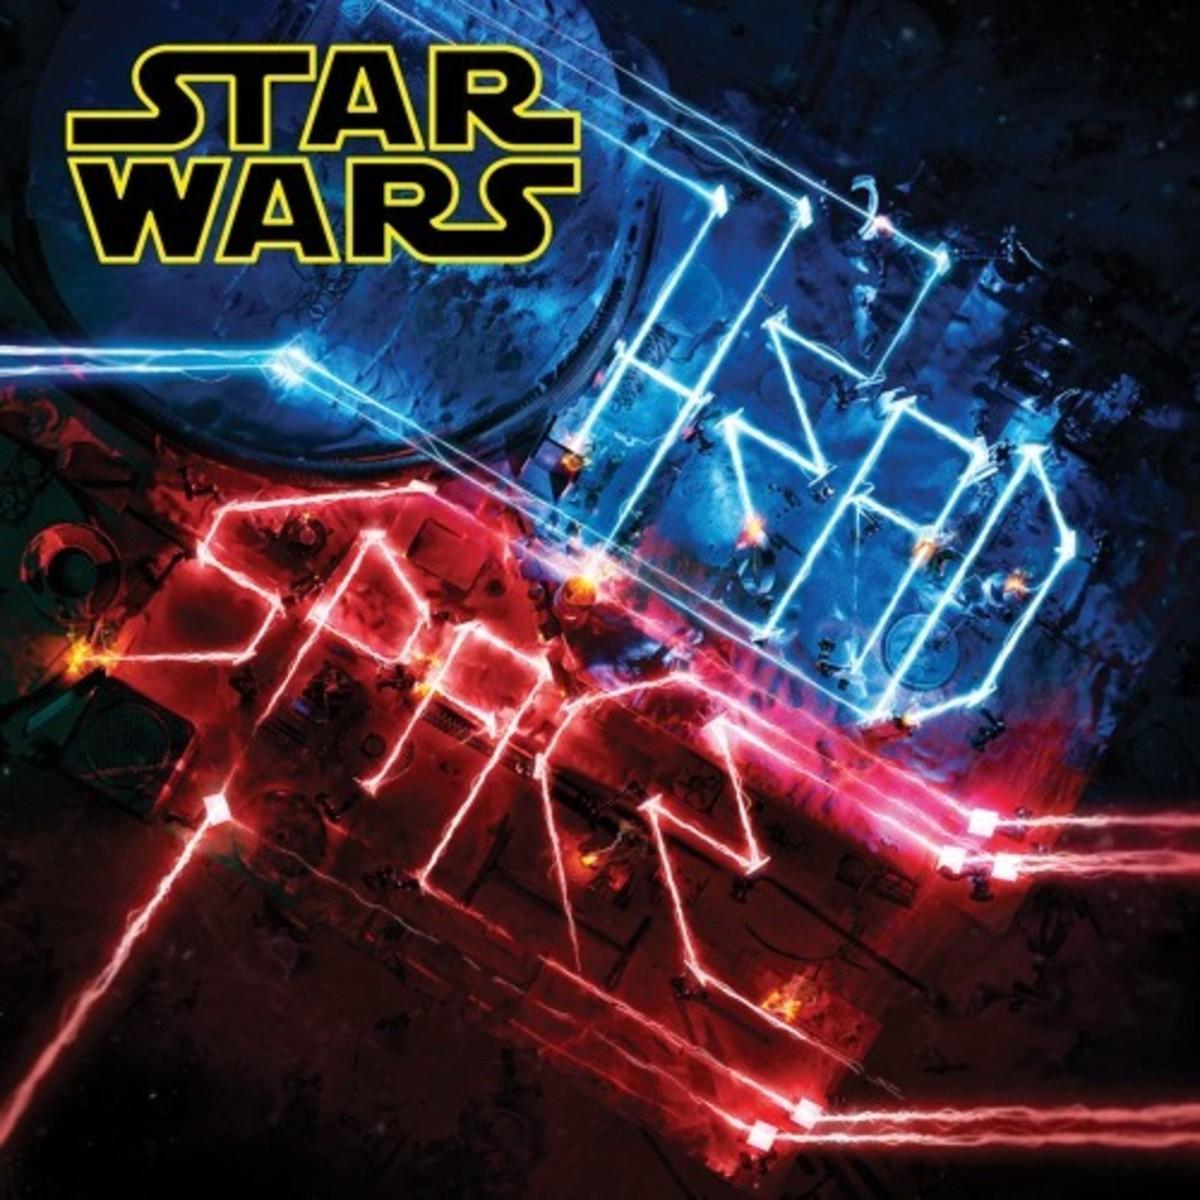 star-wars-headspace.jpg